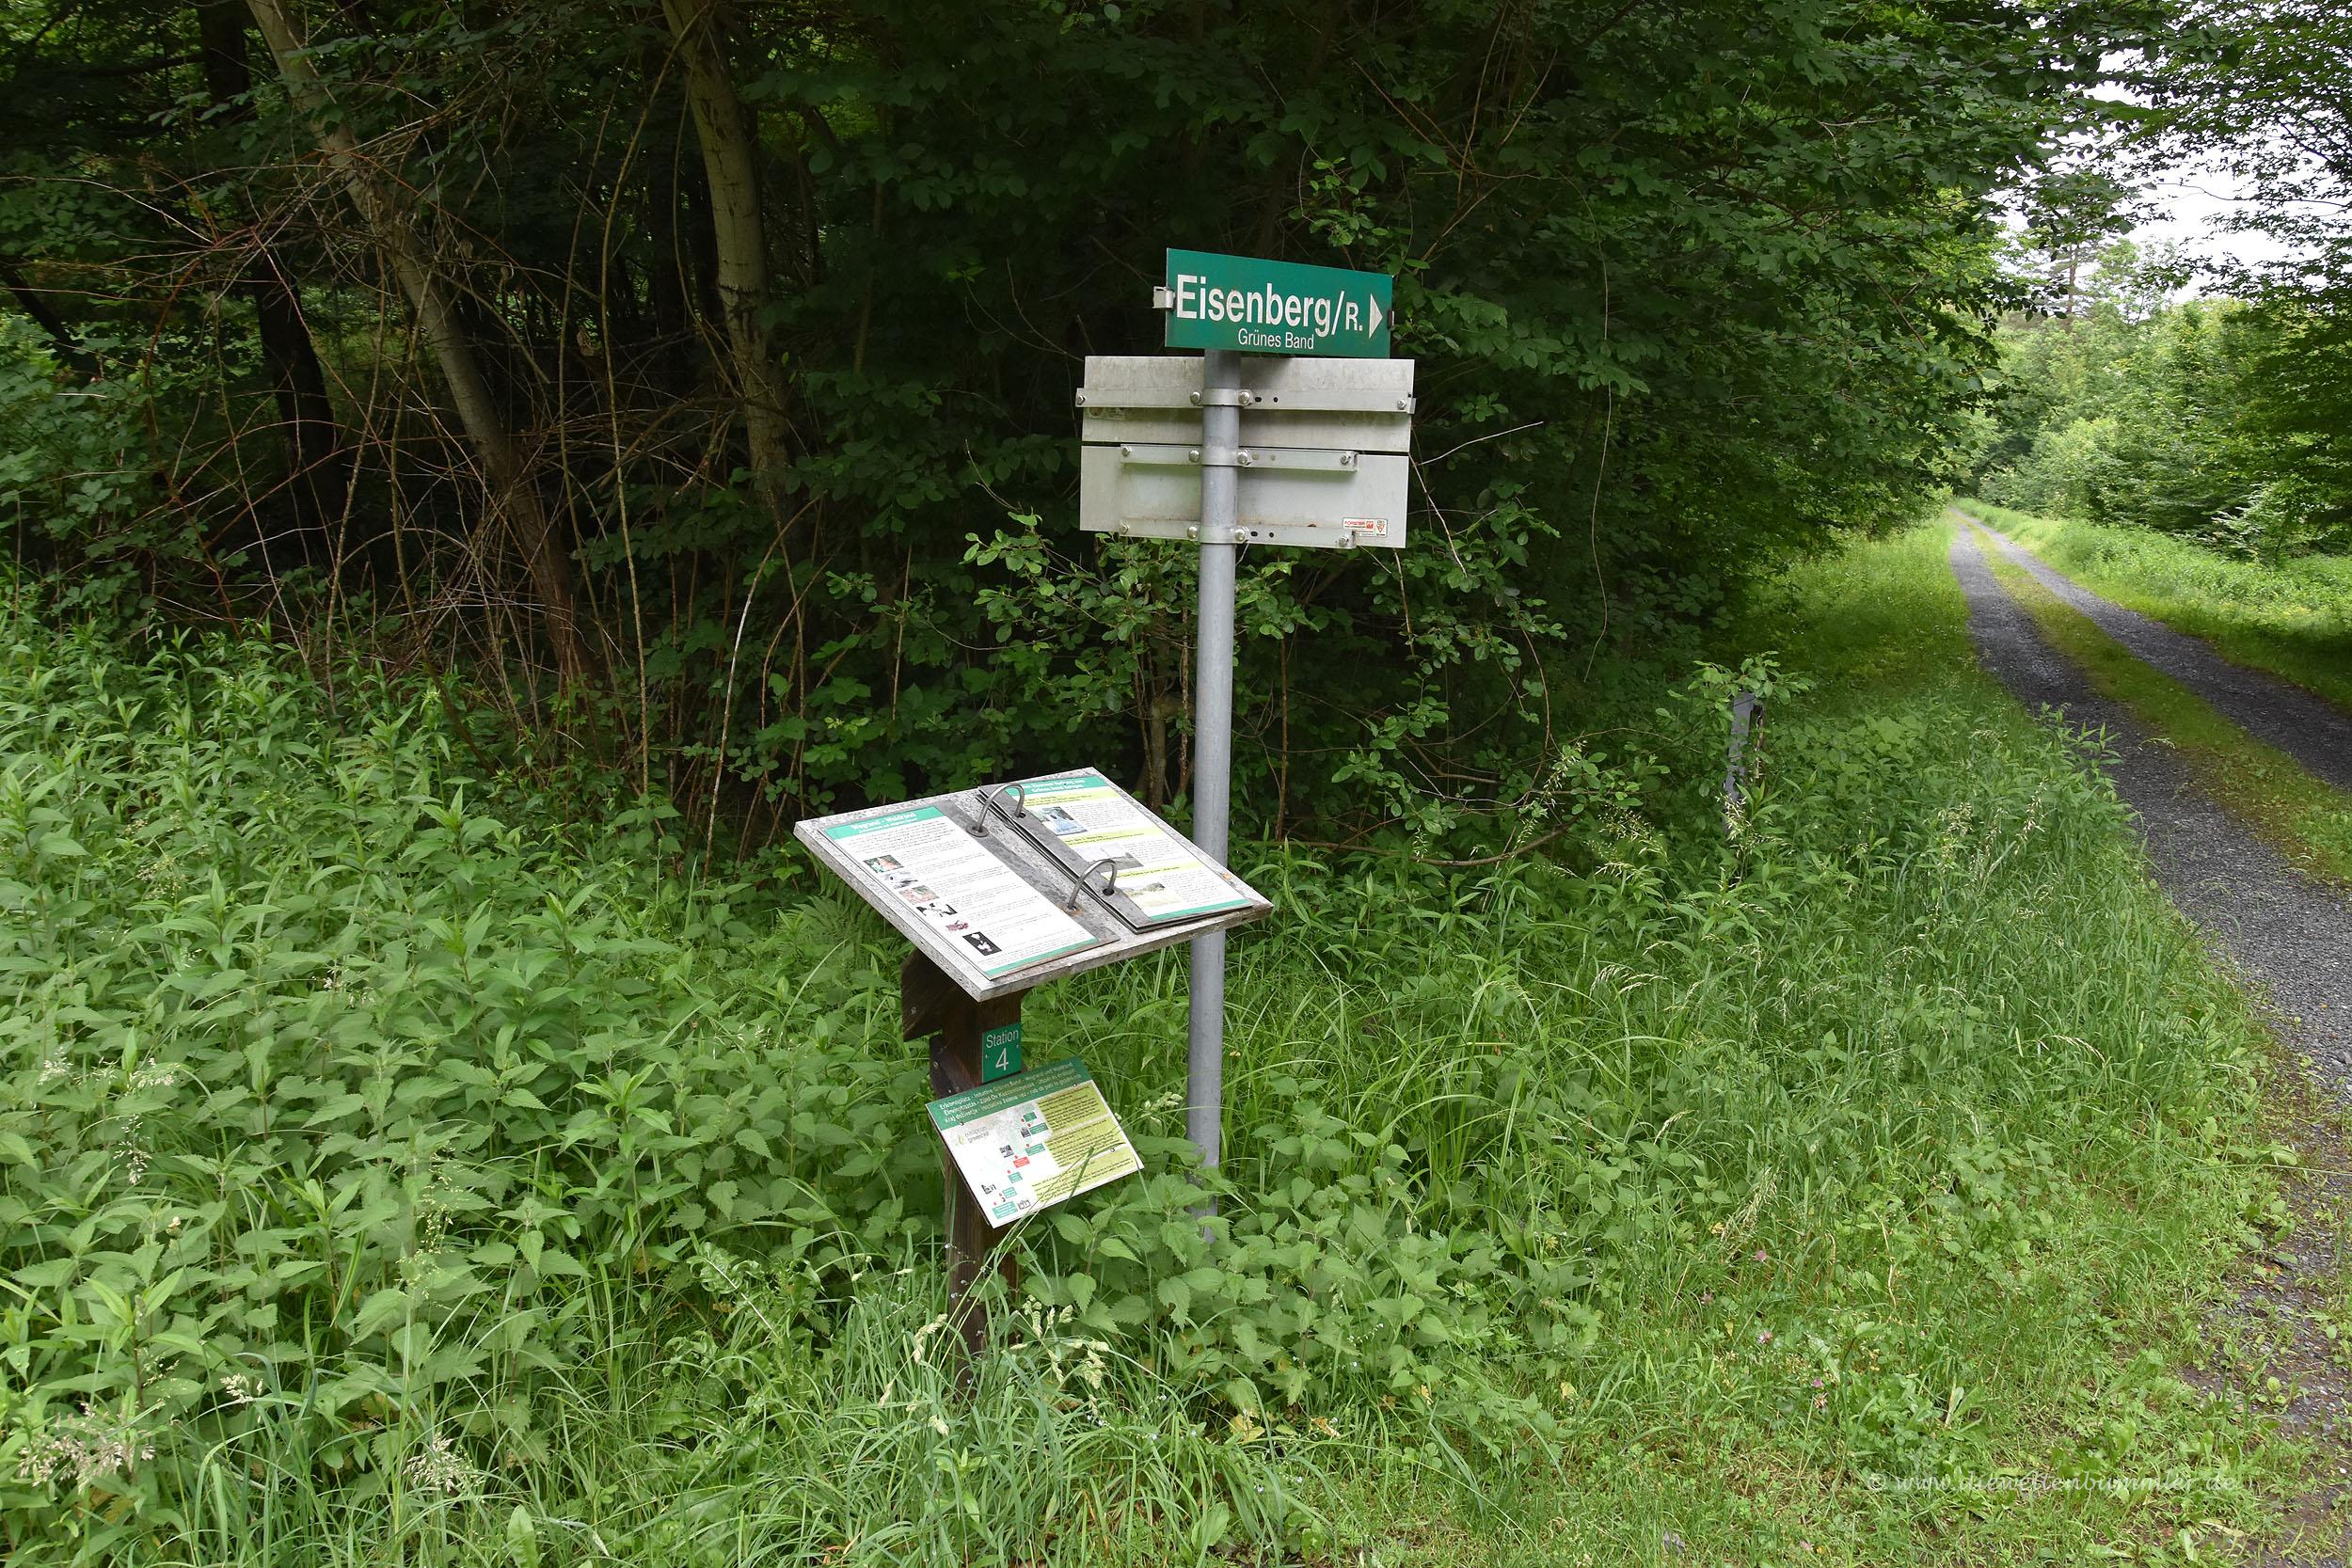 Historische Hinweise am Wegesrand